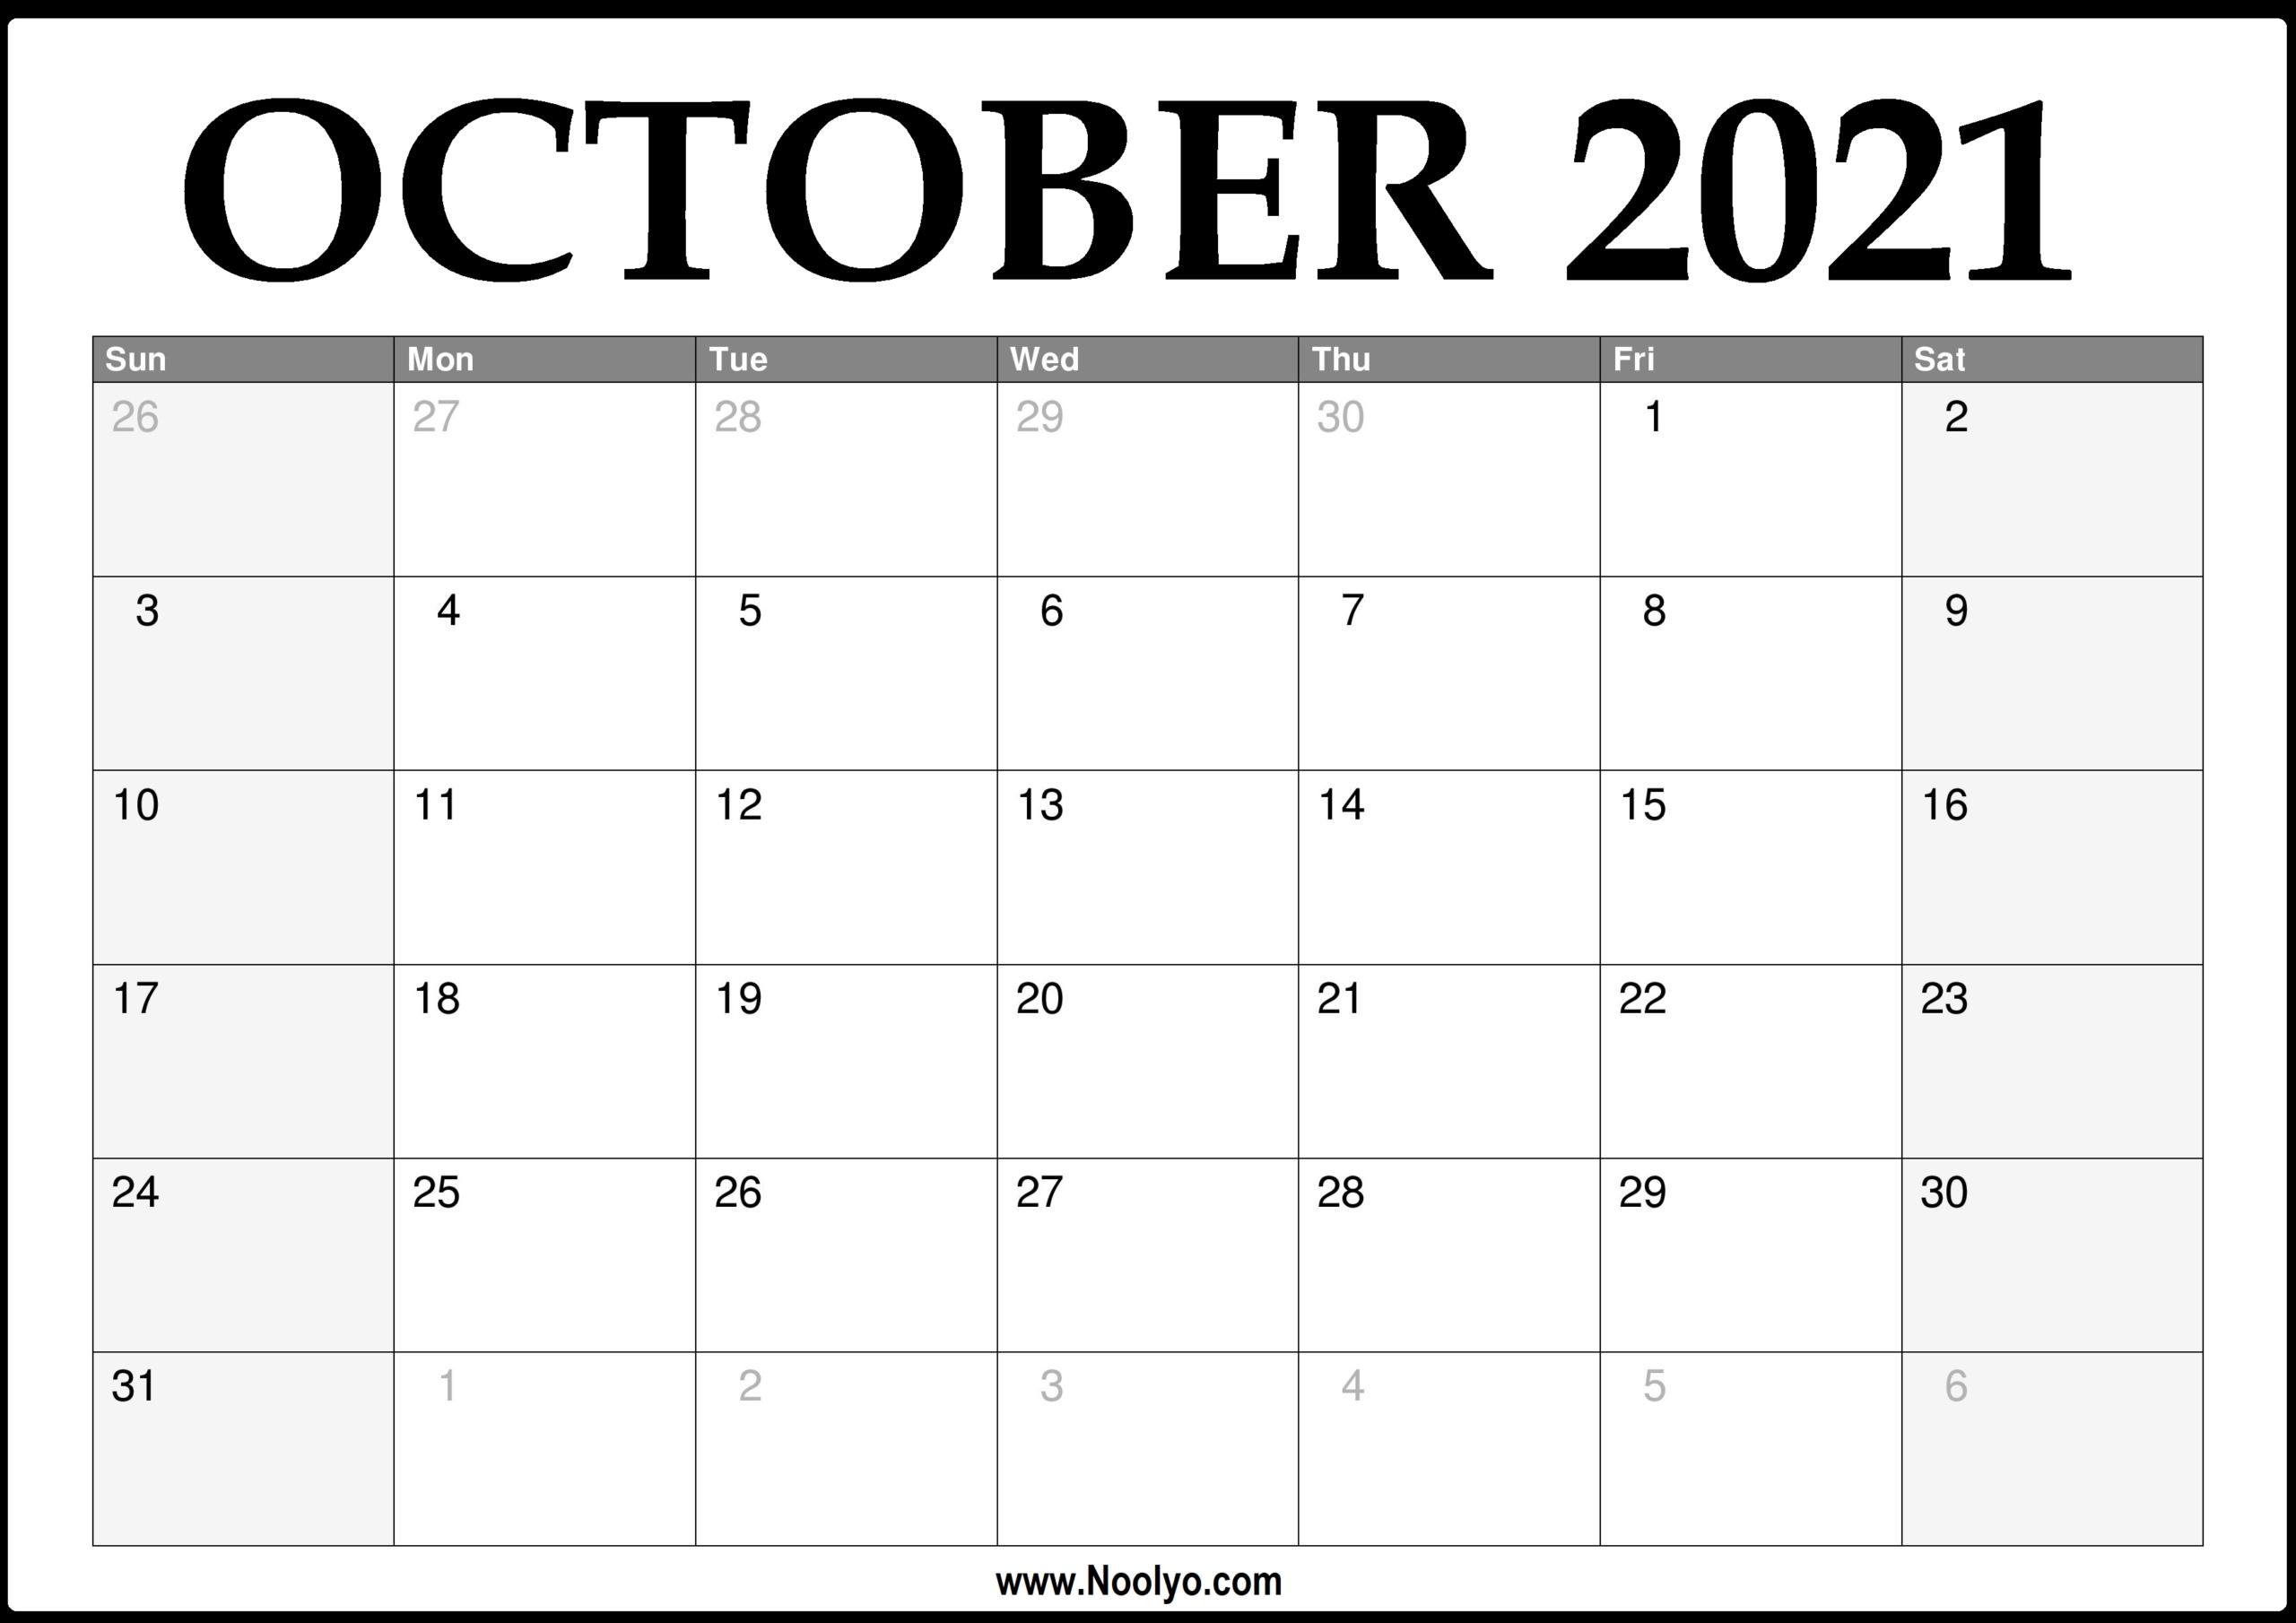 October 2021 Thru December 2021 Calendar | Calendar Printables Free Blank with regard to Free Printable Calendars 2021 Monthly